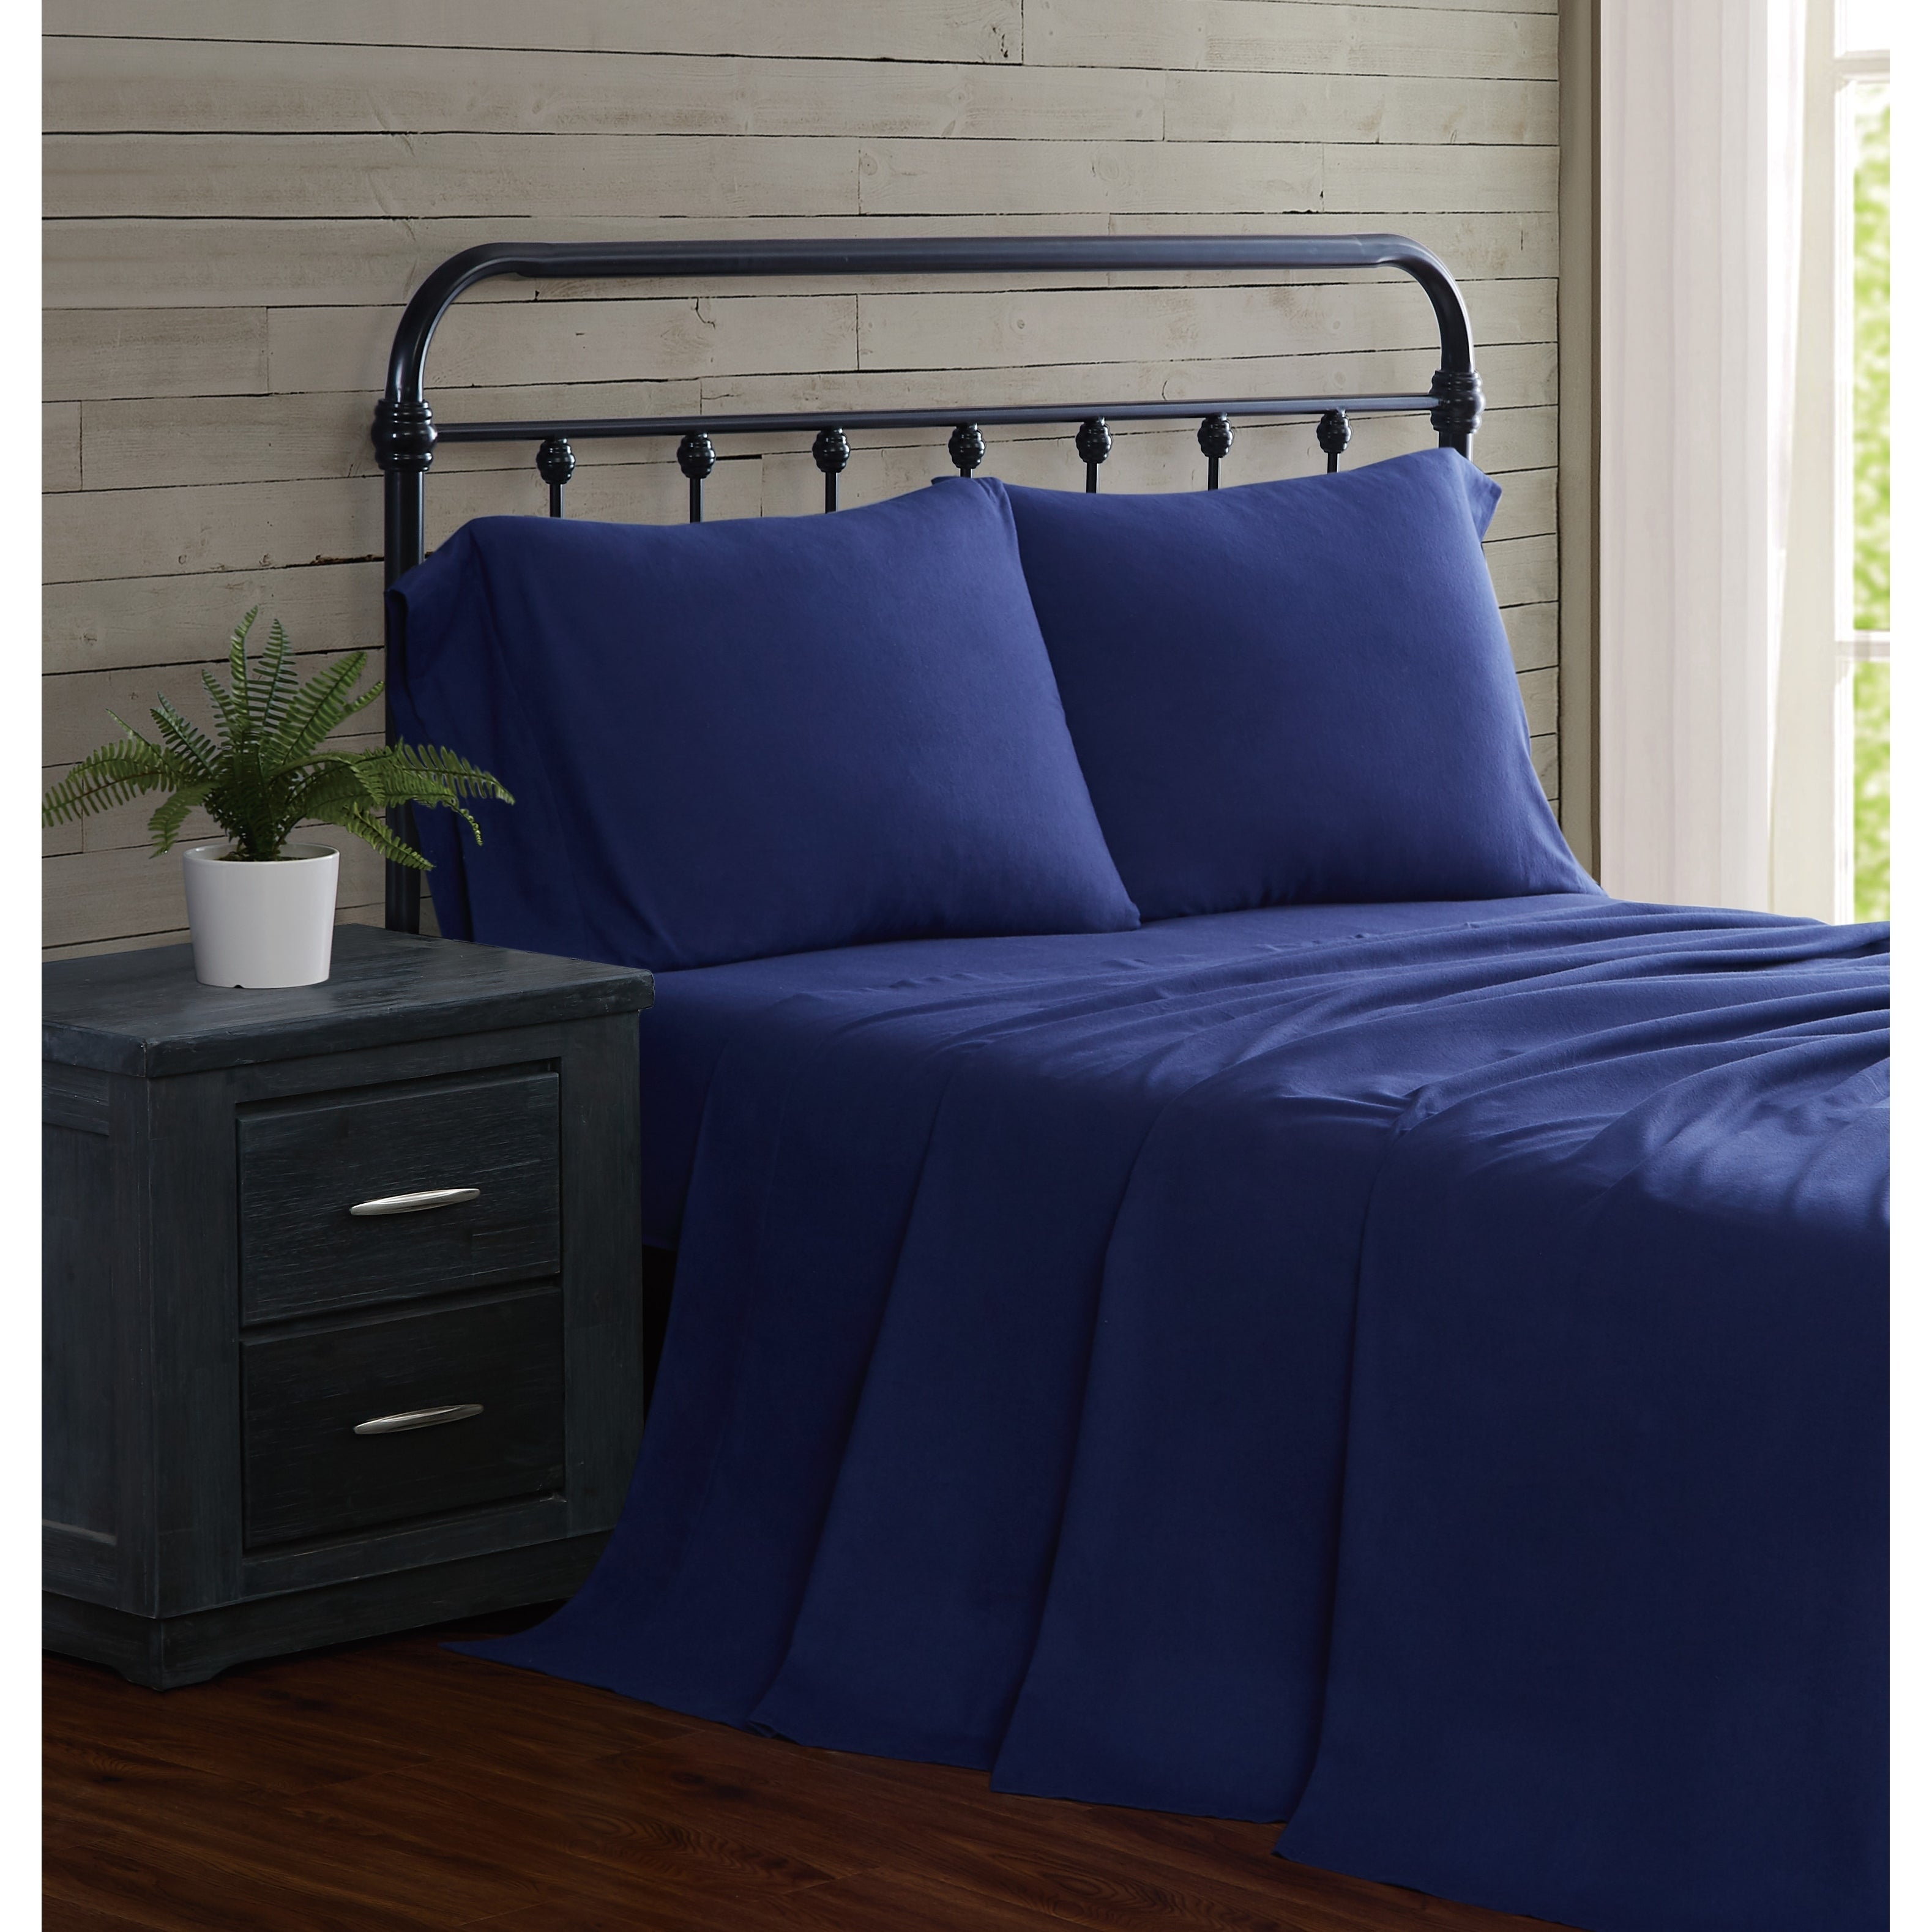 Bedding London Fog 4 Piece Twin Twinxl Luxury Sheet Sets Blue Netpackmdz Com Ar